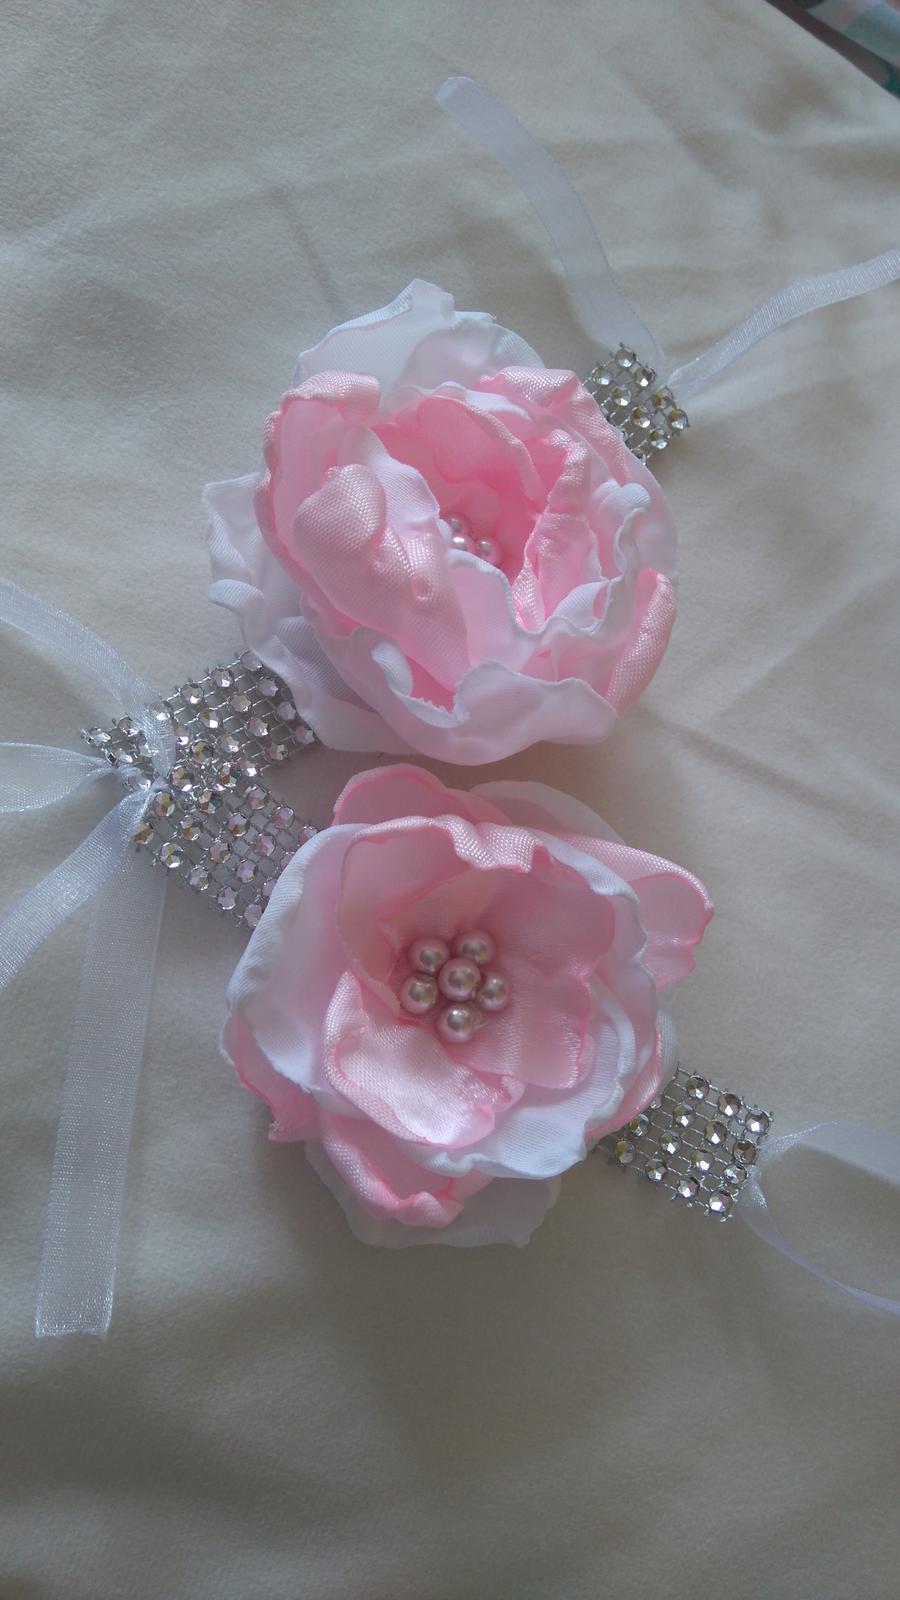 Bude svadba, svadbička :) - detail ;-)